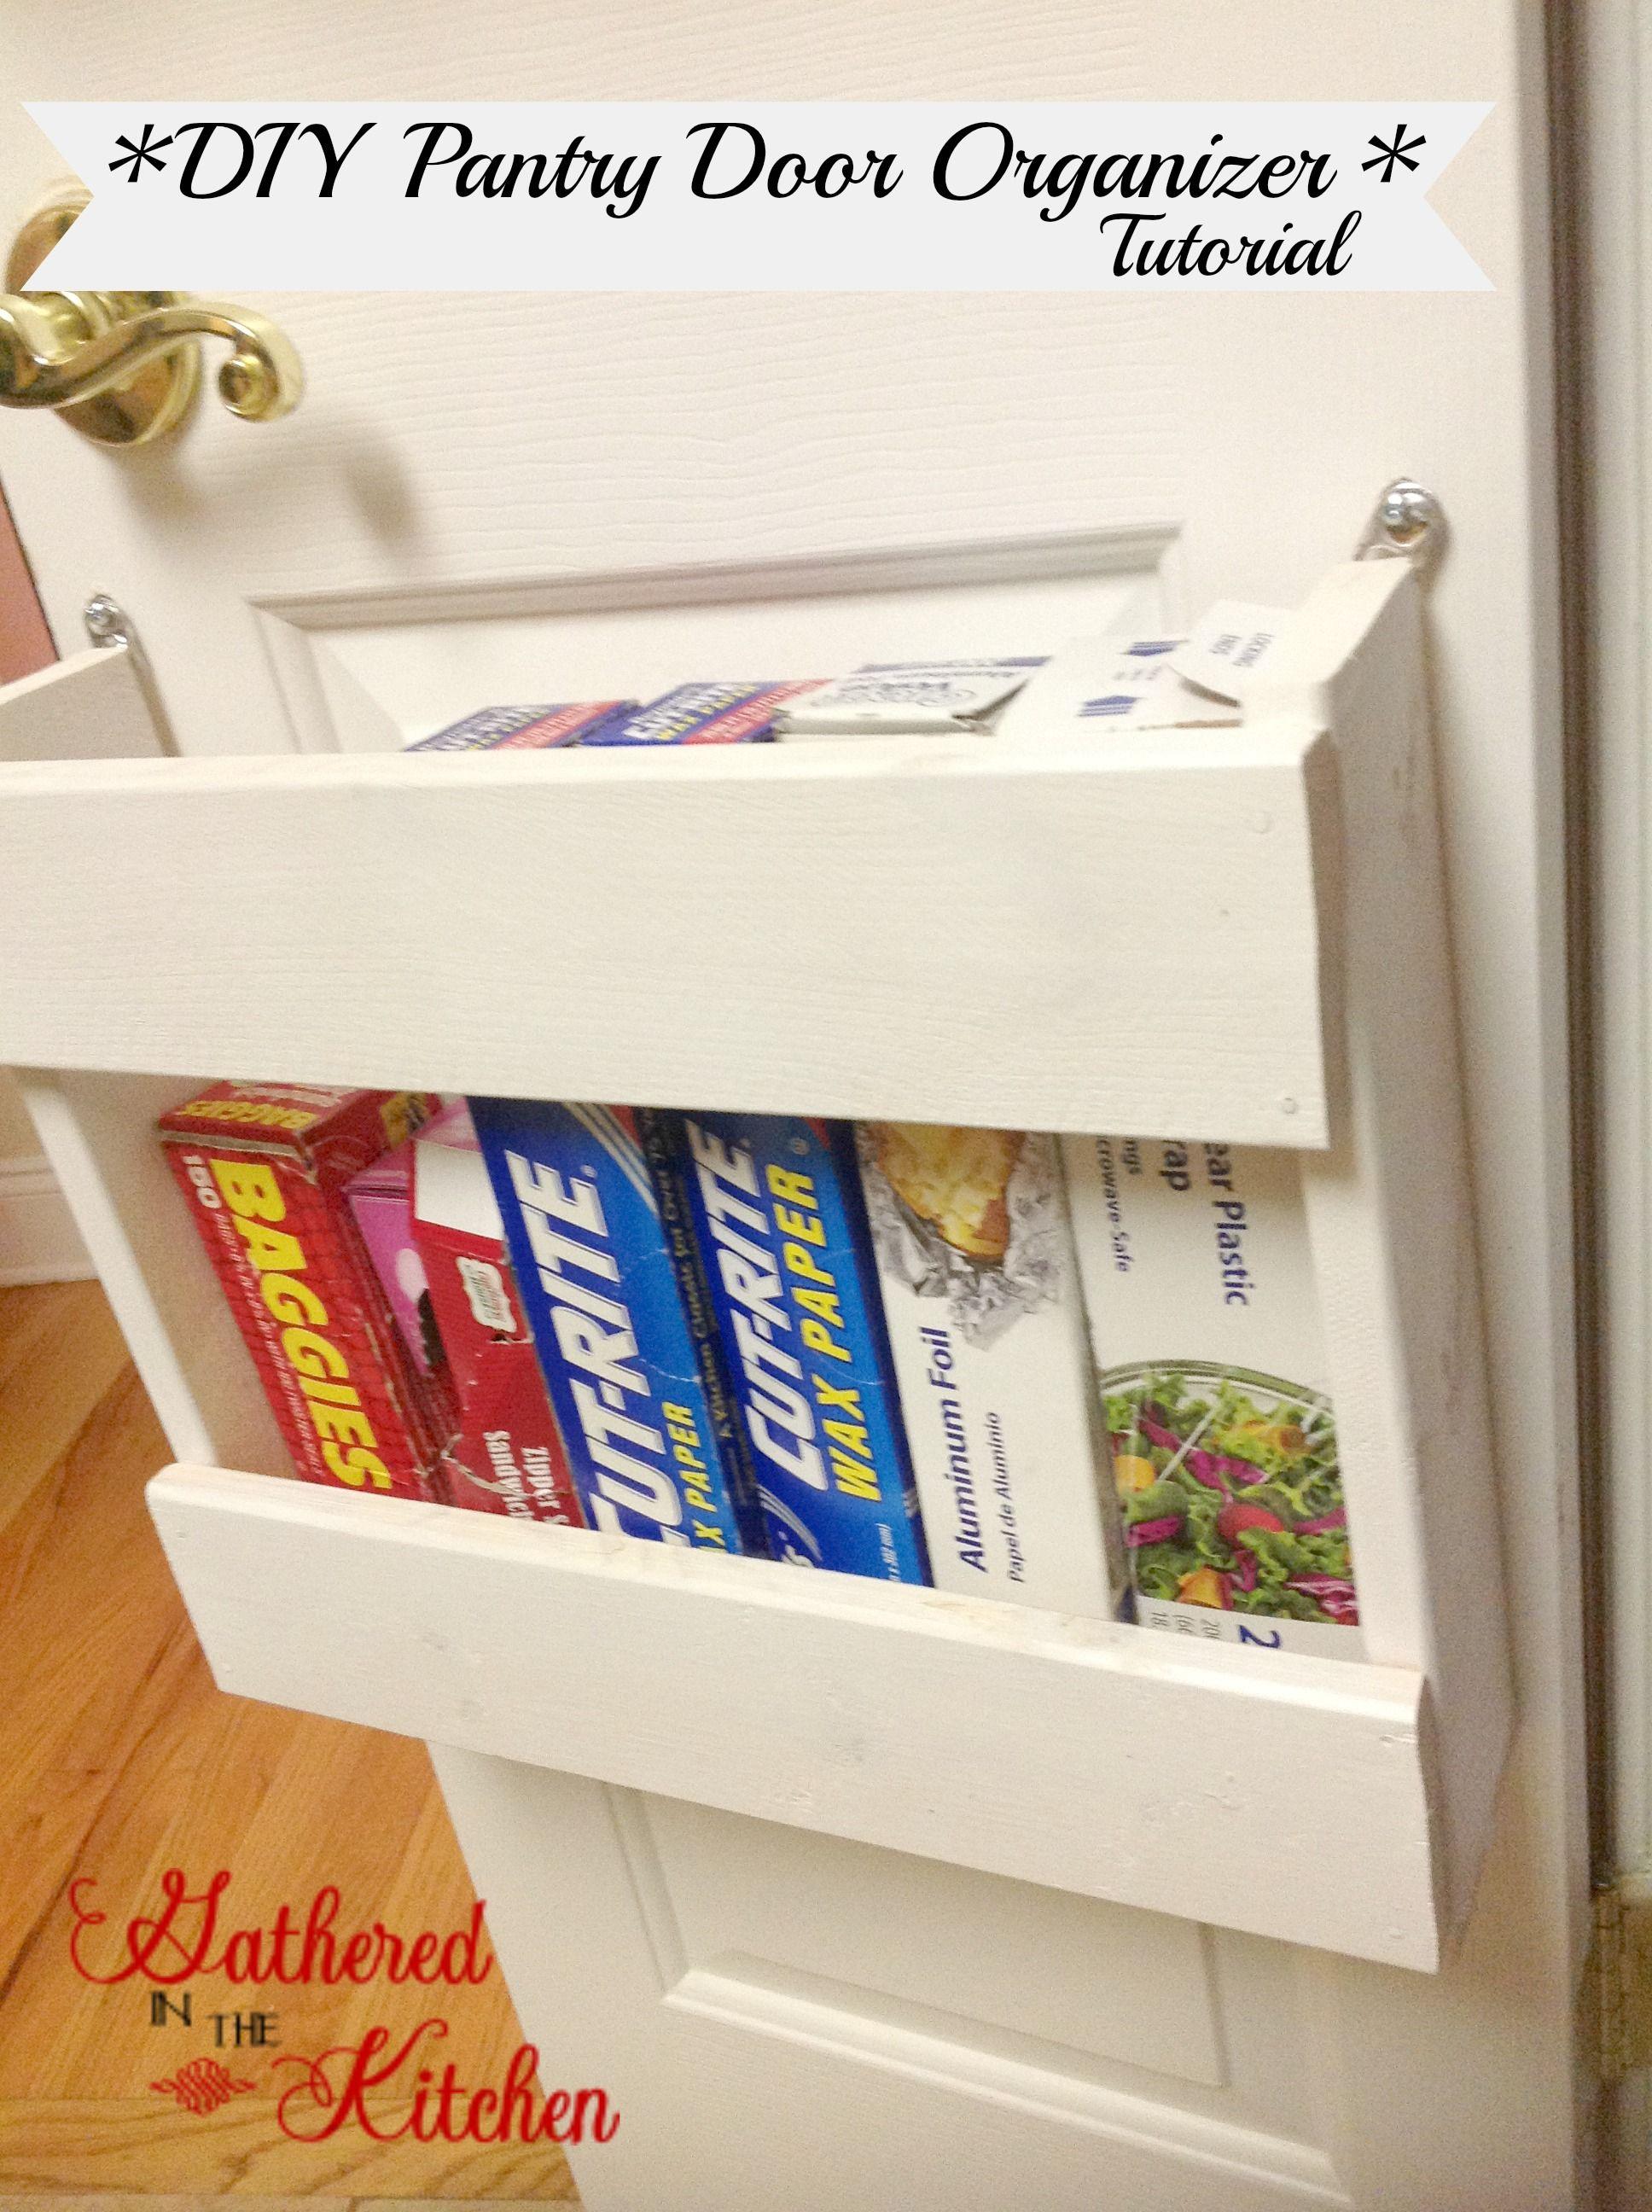 Pantry Organizer - DIY Foil & More Organizer